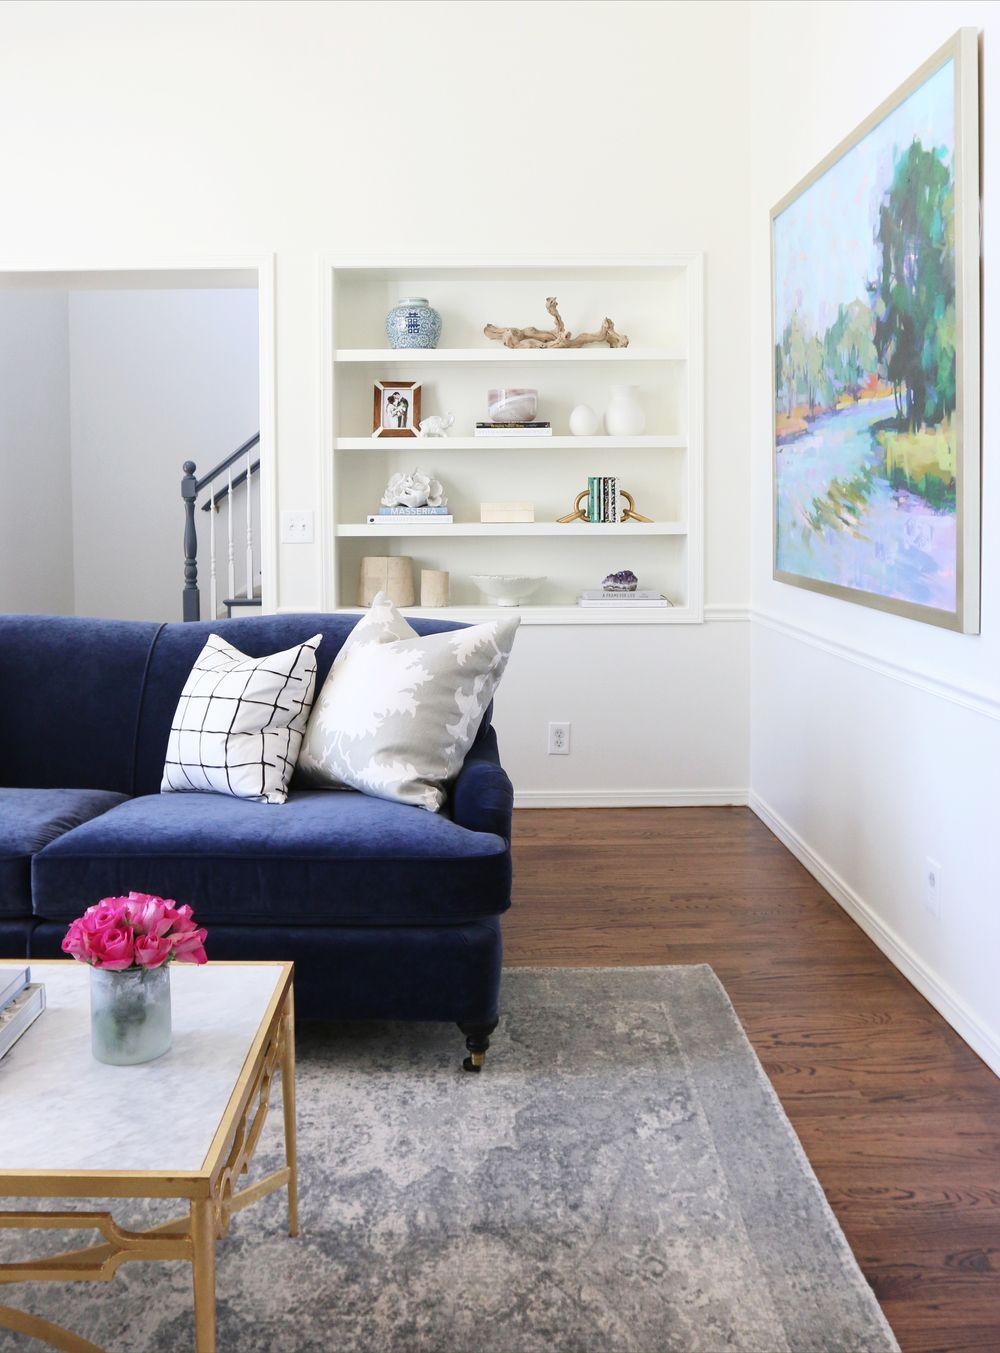 Living Room Makeover: Ryan Park Project | Pinterest | Studio mcgee ...